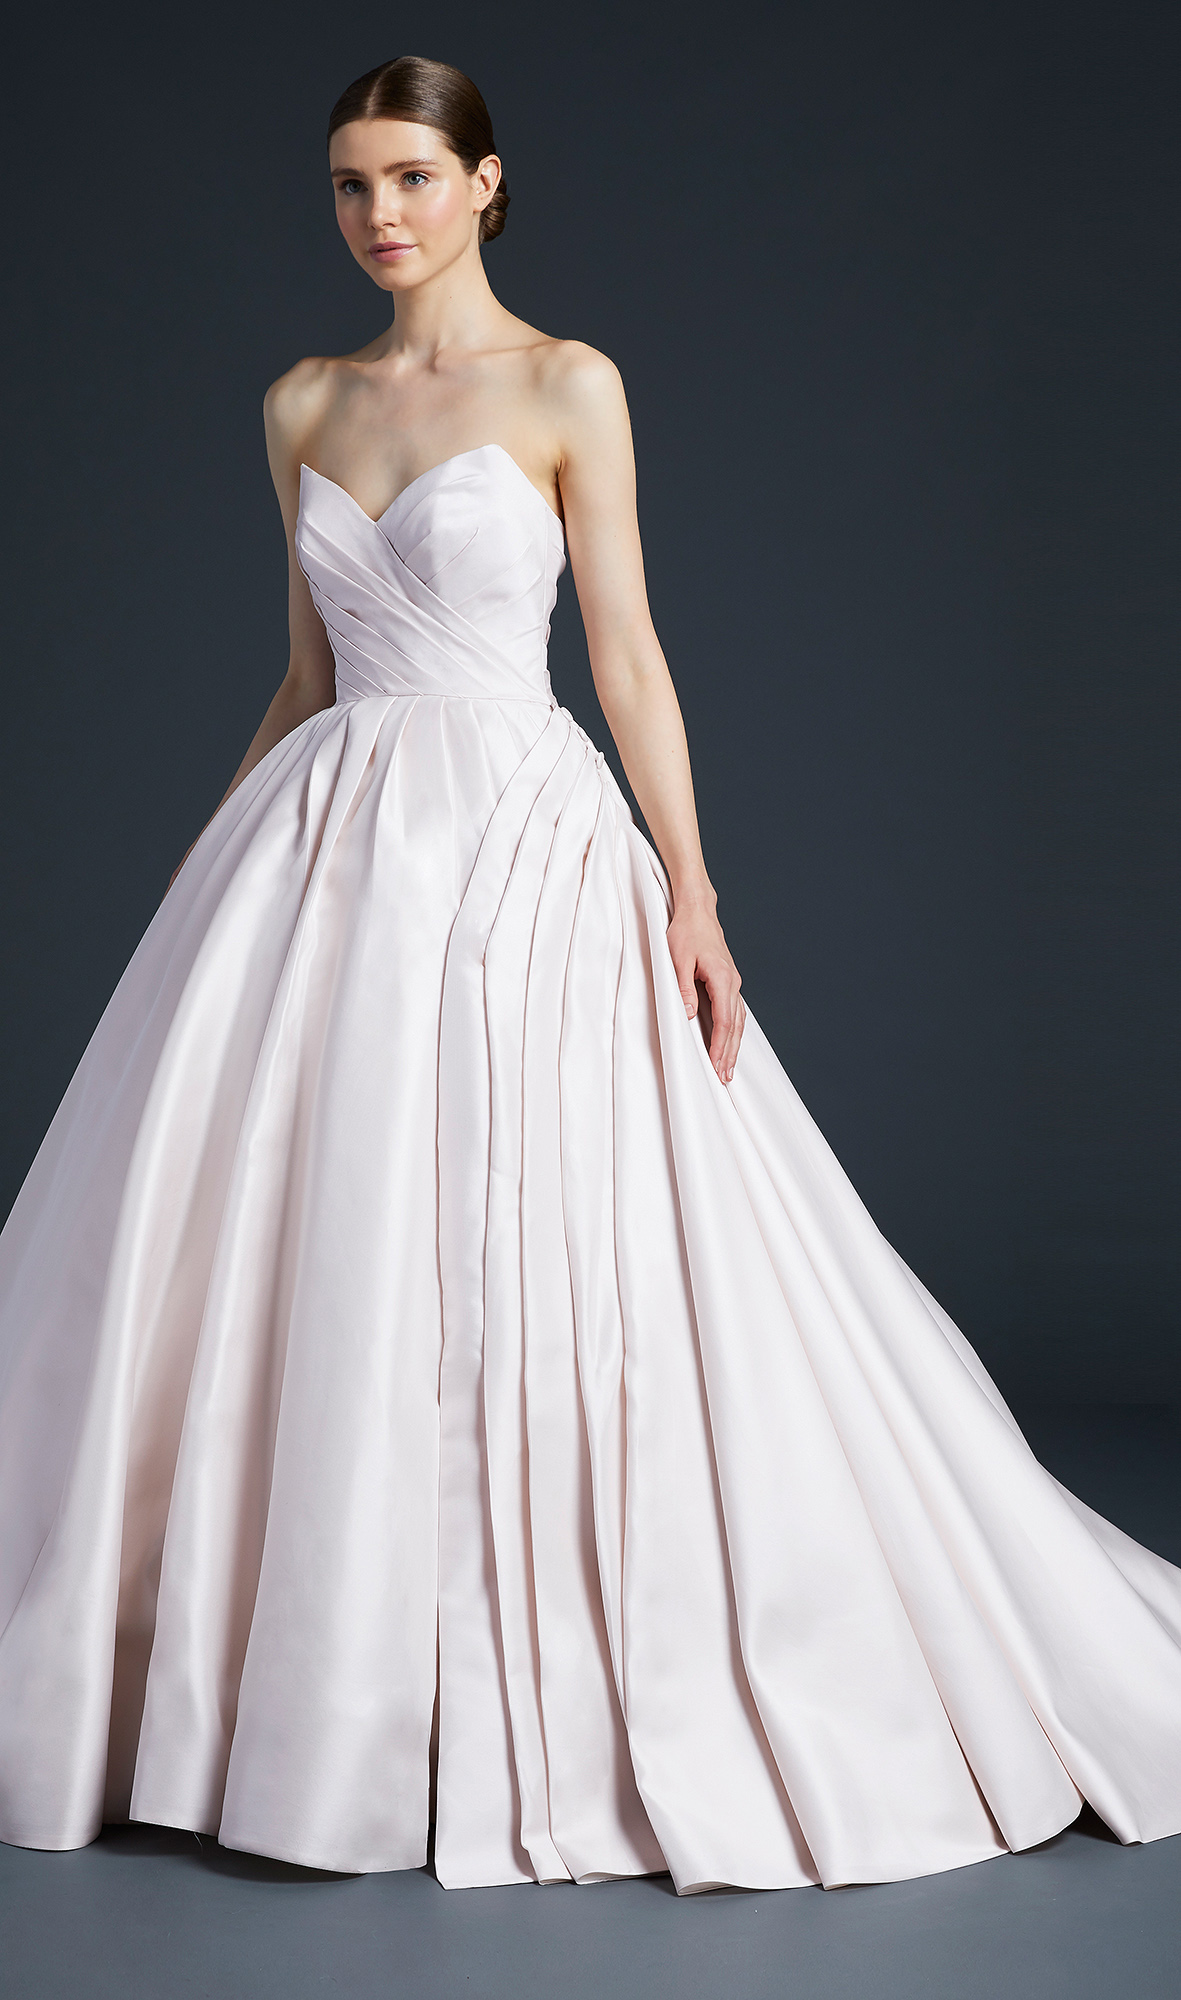 anne barge pleated sweetheart wedding dress fall 2019